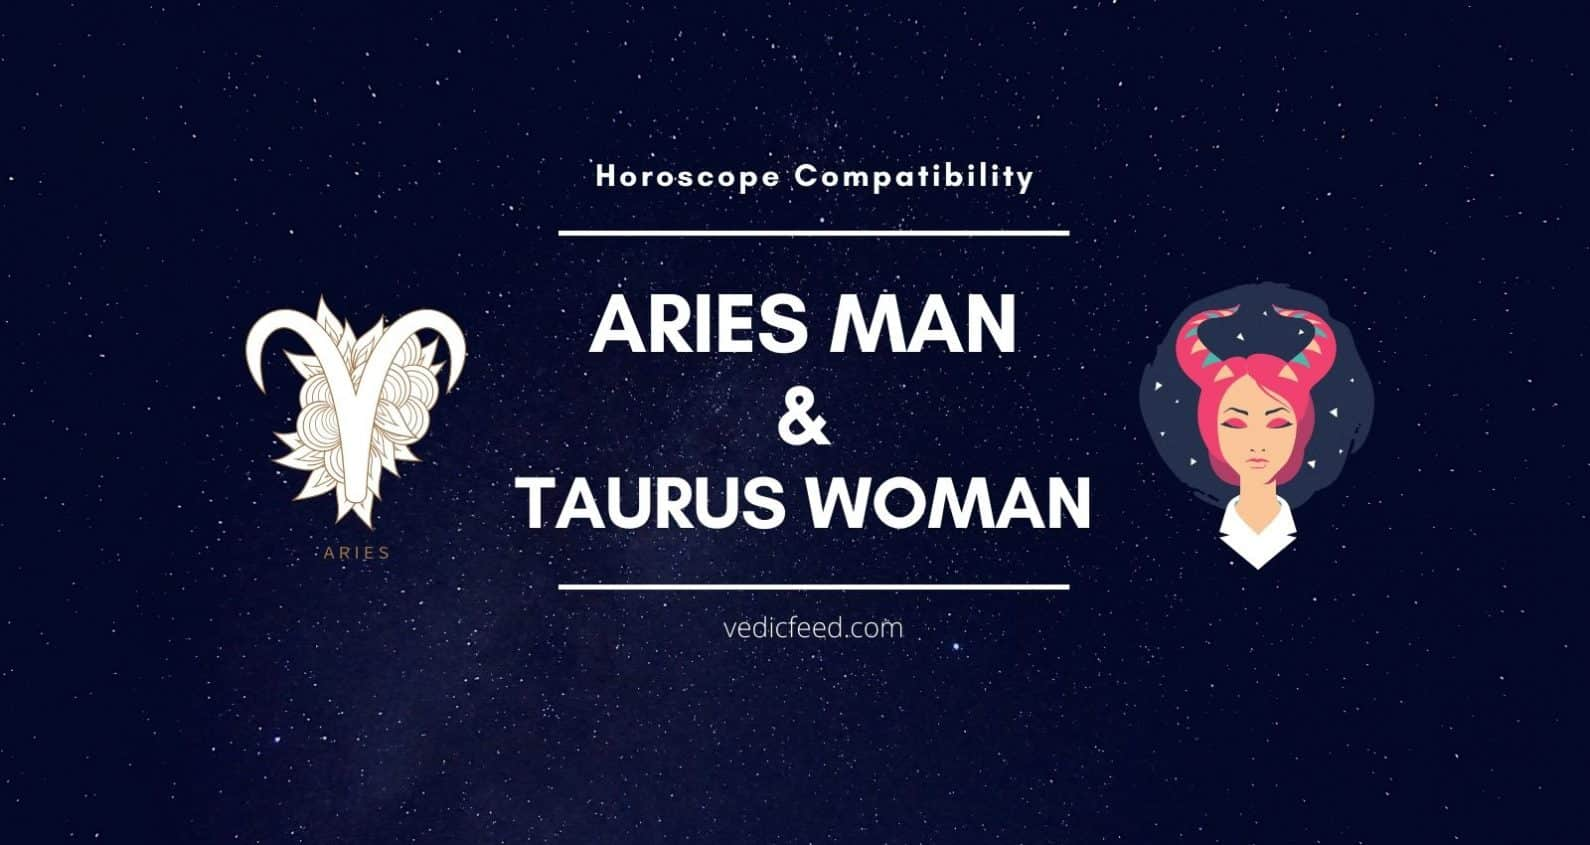 Aries Man and Taurus Woman